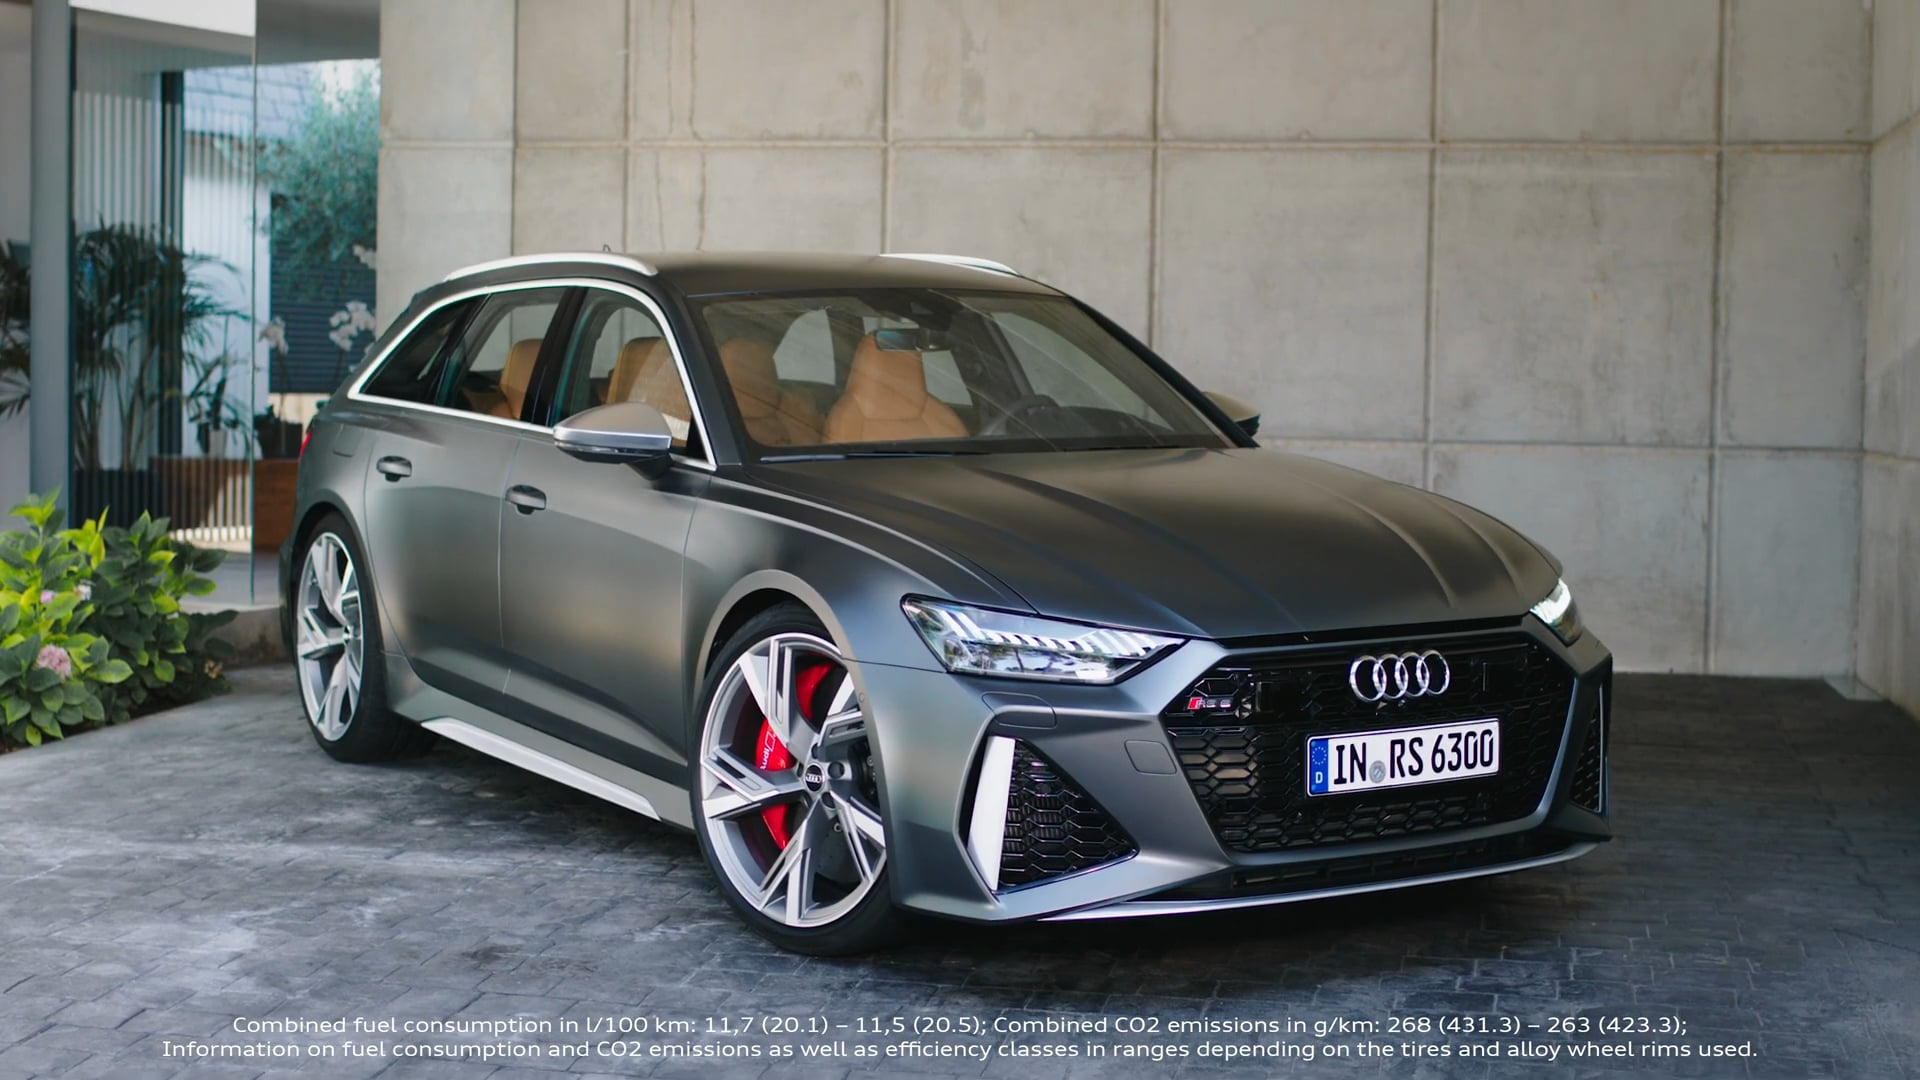 Audi RS 6 Avant Trailer